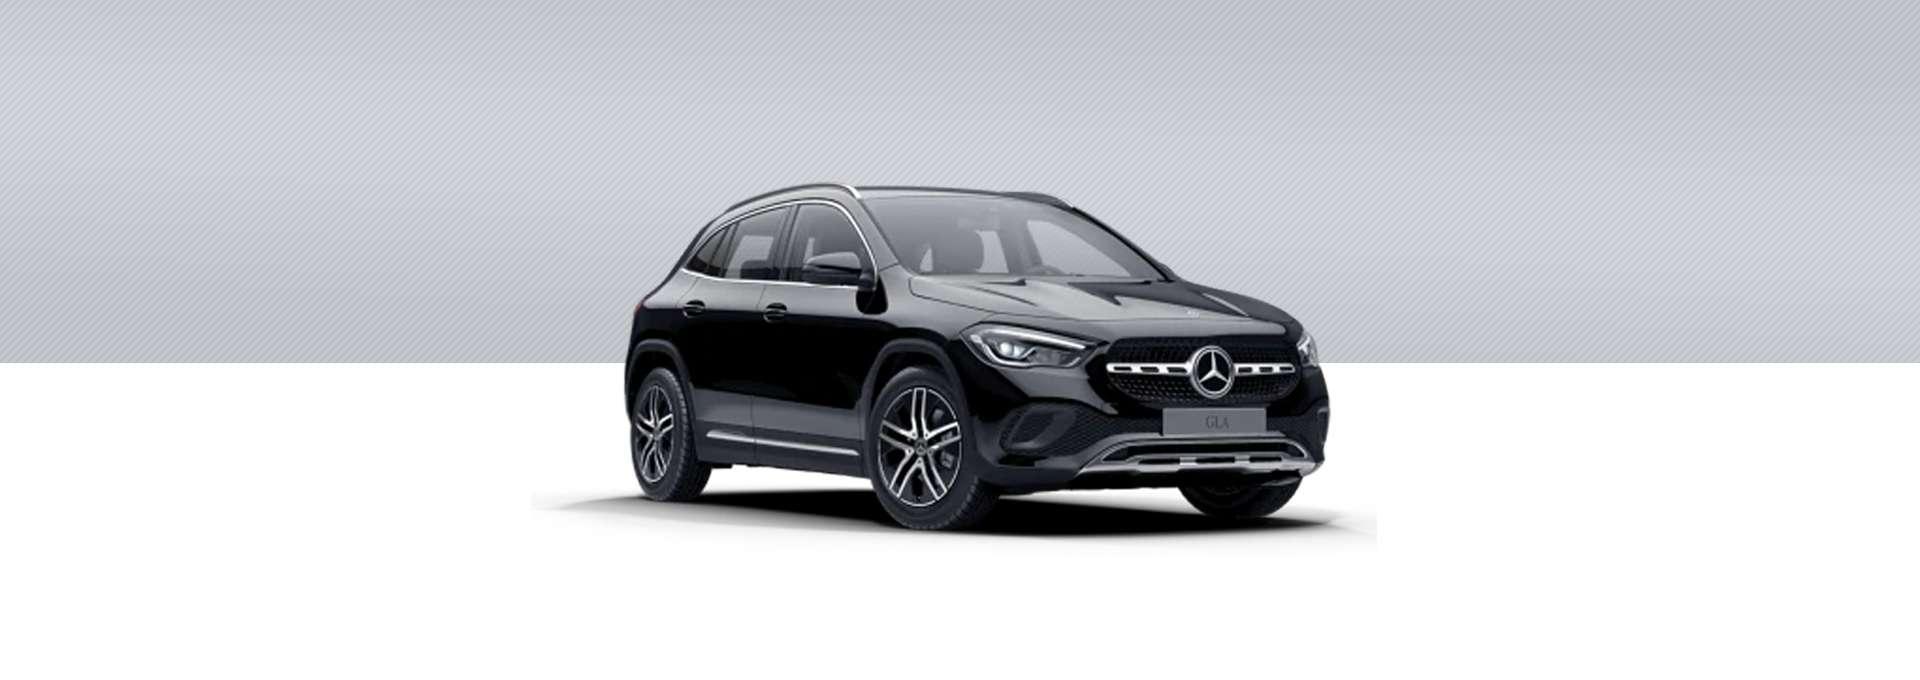 Mercedes Benz NUEVO GLA SUV